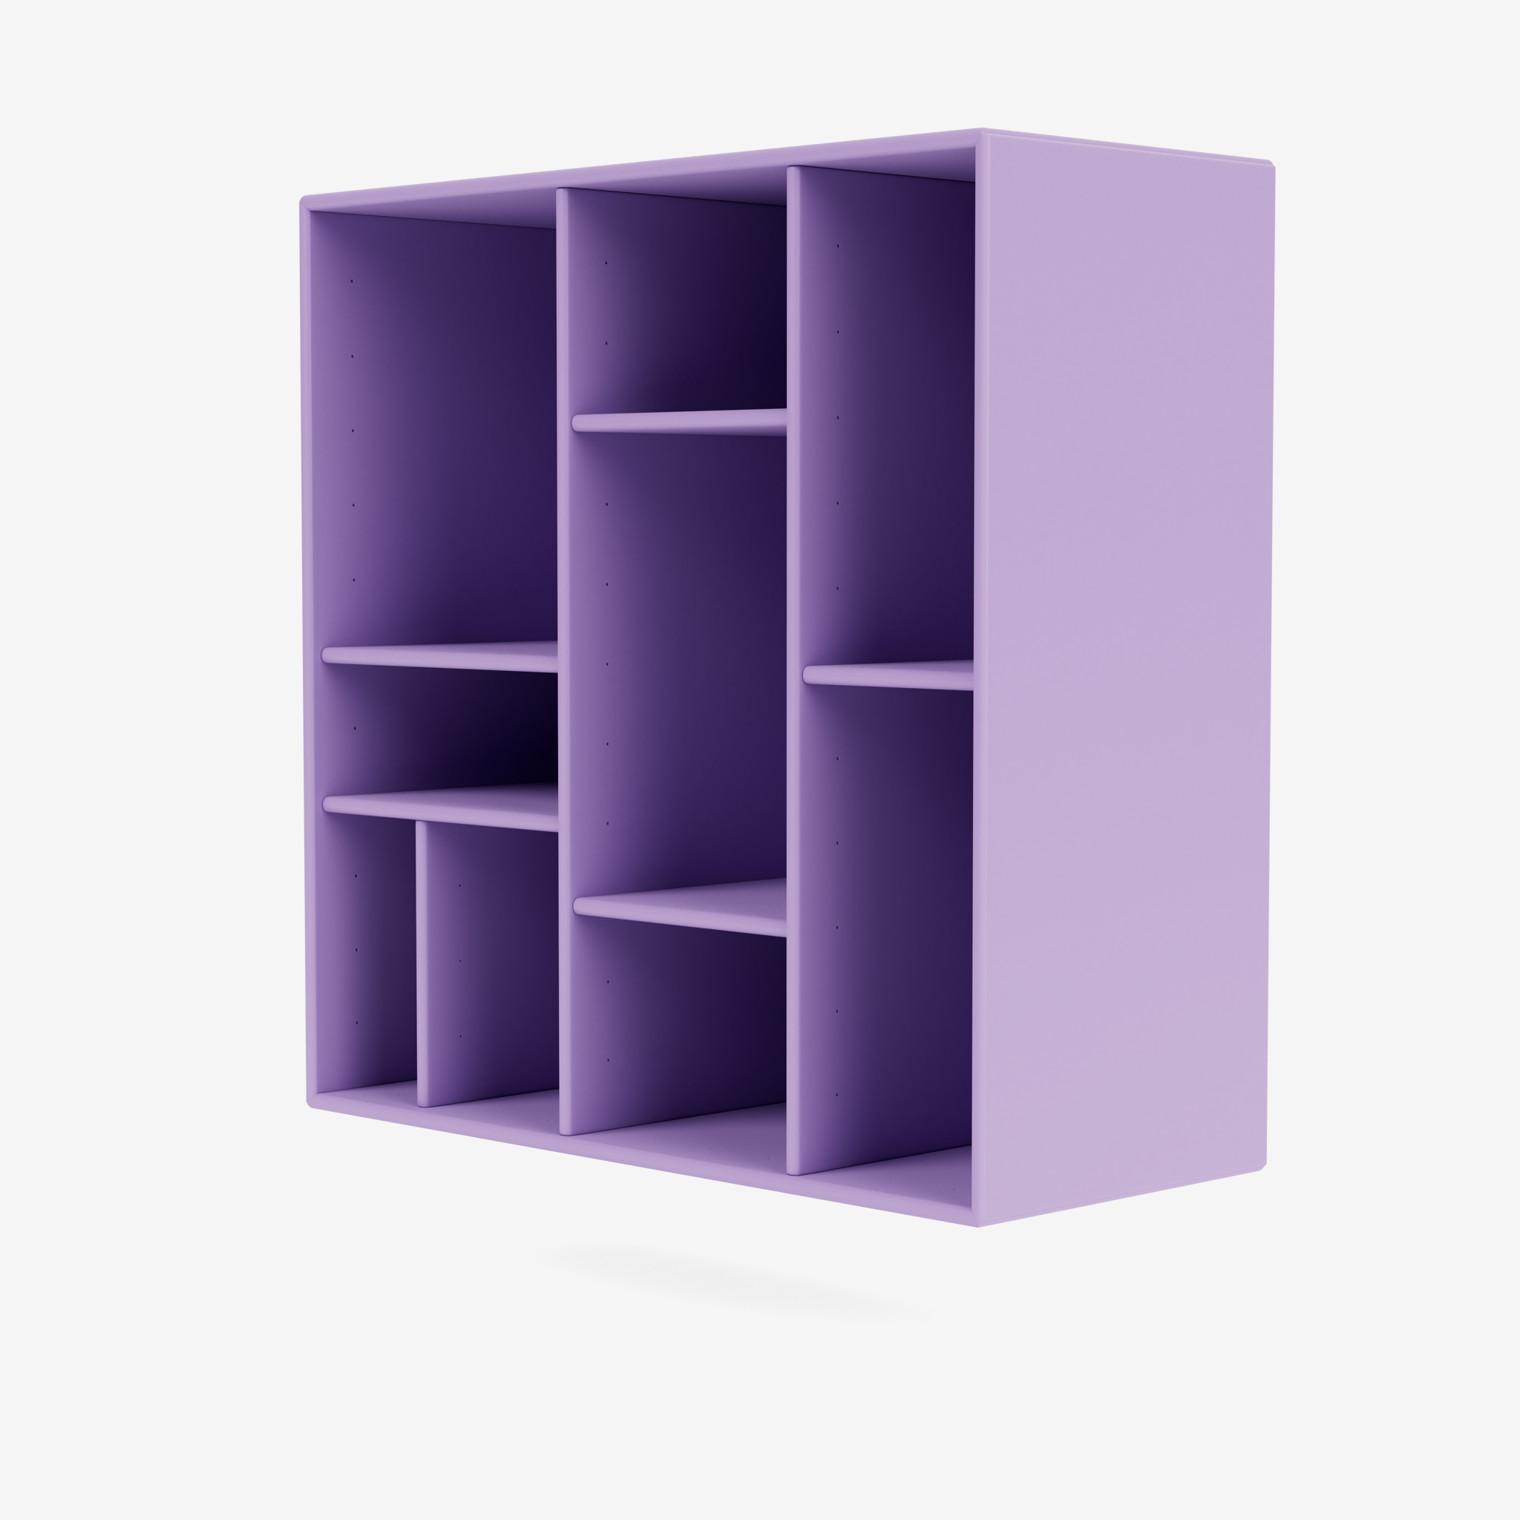 Shelf 1613 - COMPILE